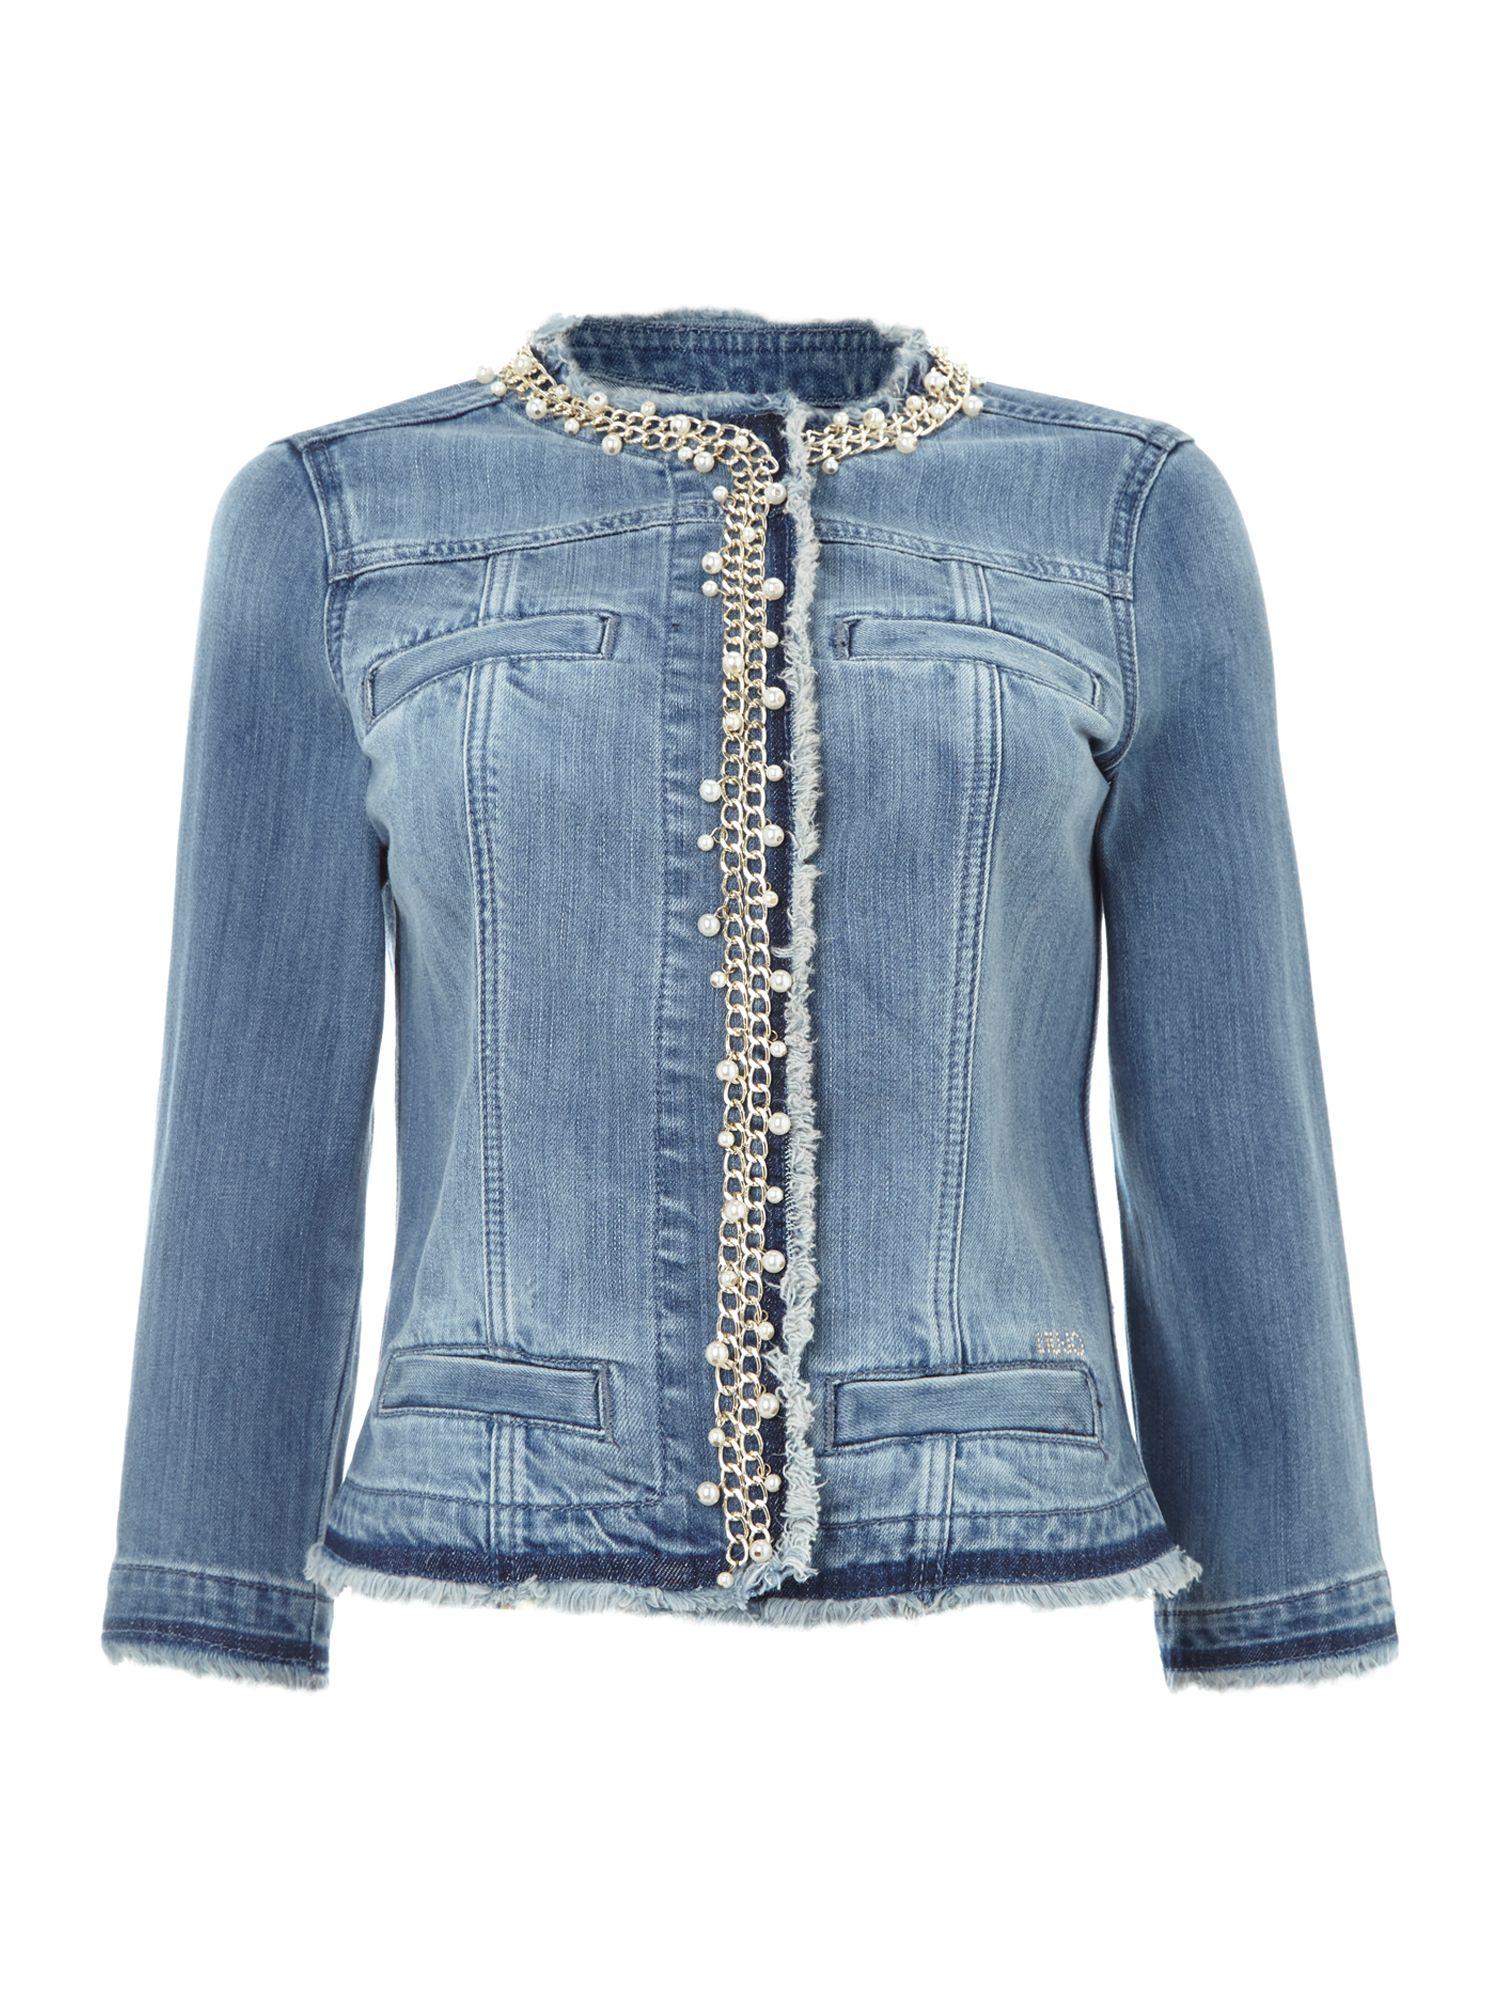 Liu Jo Pearl Chain Trim Denim Jacket In Blue Lyst